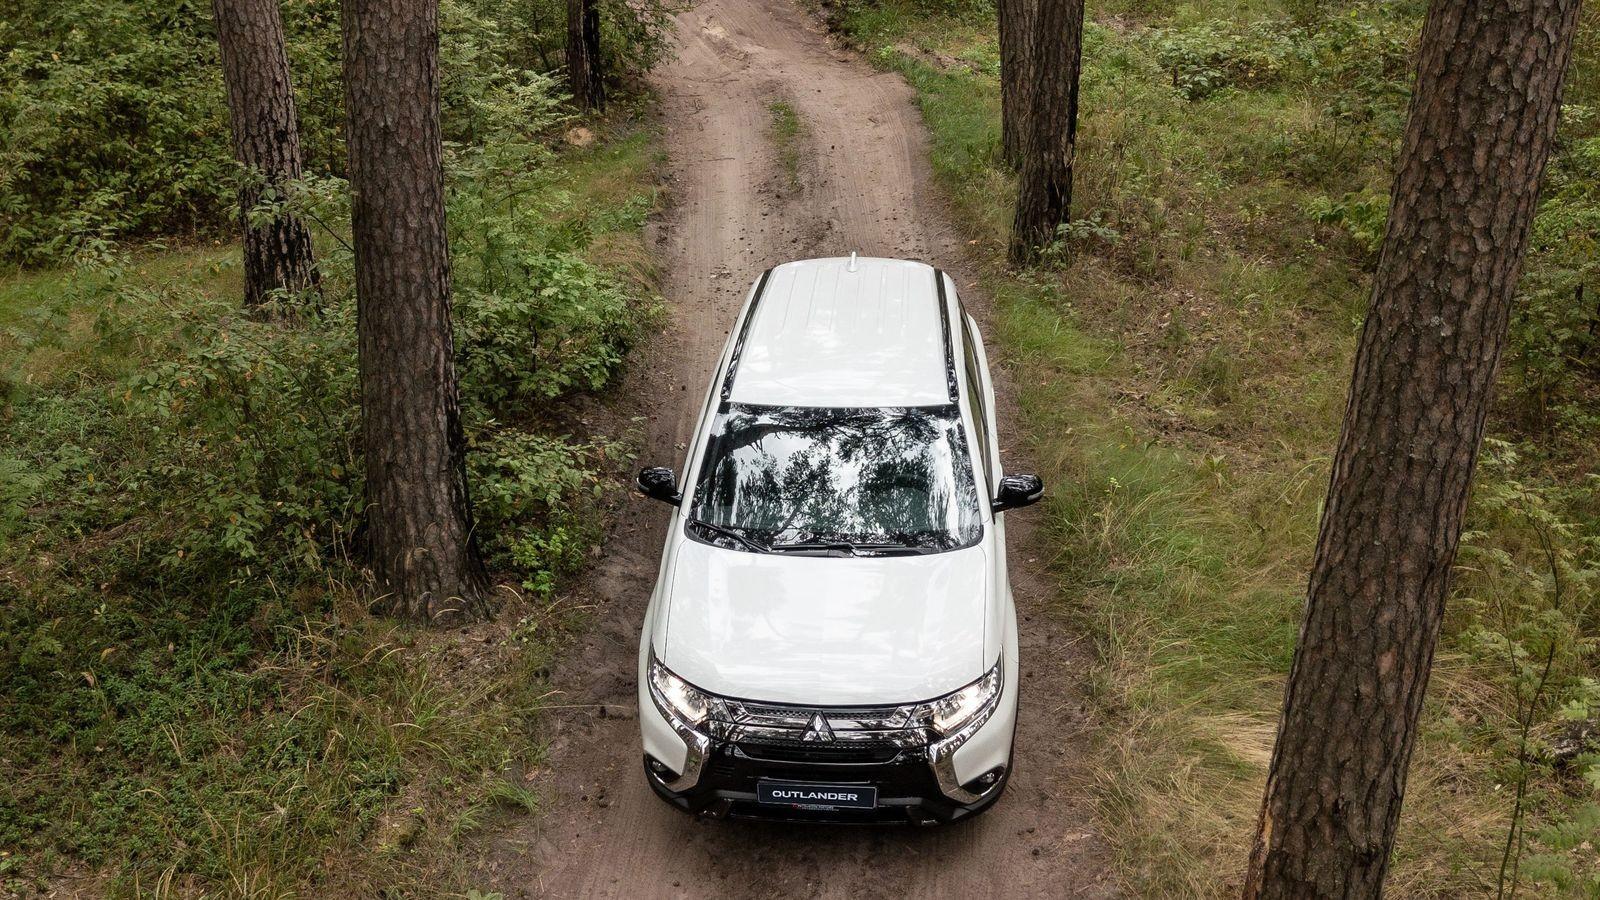 Крутилки вернули назад, а тягу распределили по колёсам: тест-драйв Mitsubishi Outlander 2020